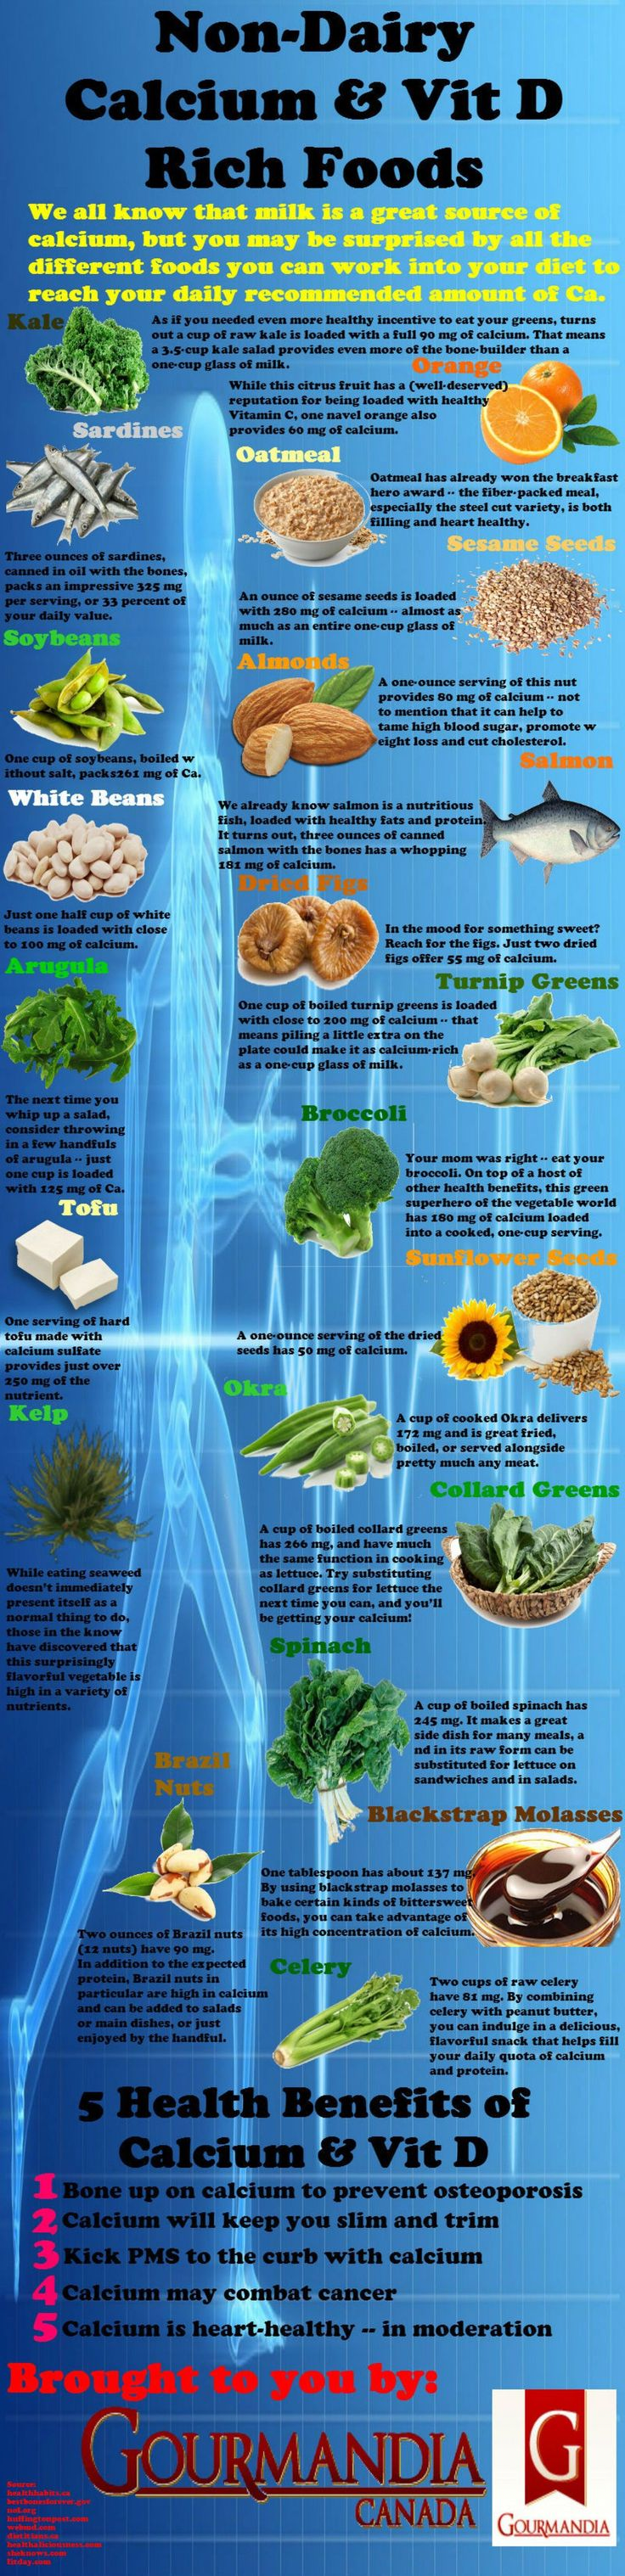 Non-Dairy Calcium & Vit D Rich Foods http://visual.ly/non-dairy-calcium-vit-d-rich-foods ||||| For great deals, visit http://stores.ebay.com/Hello123India